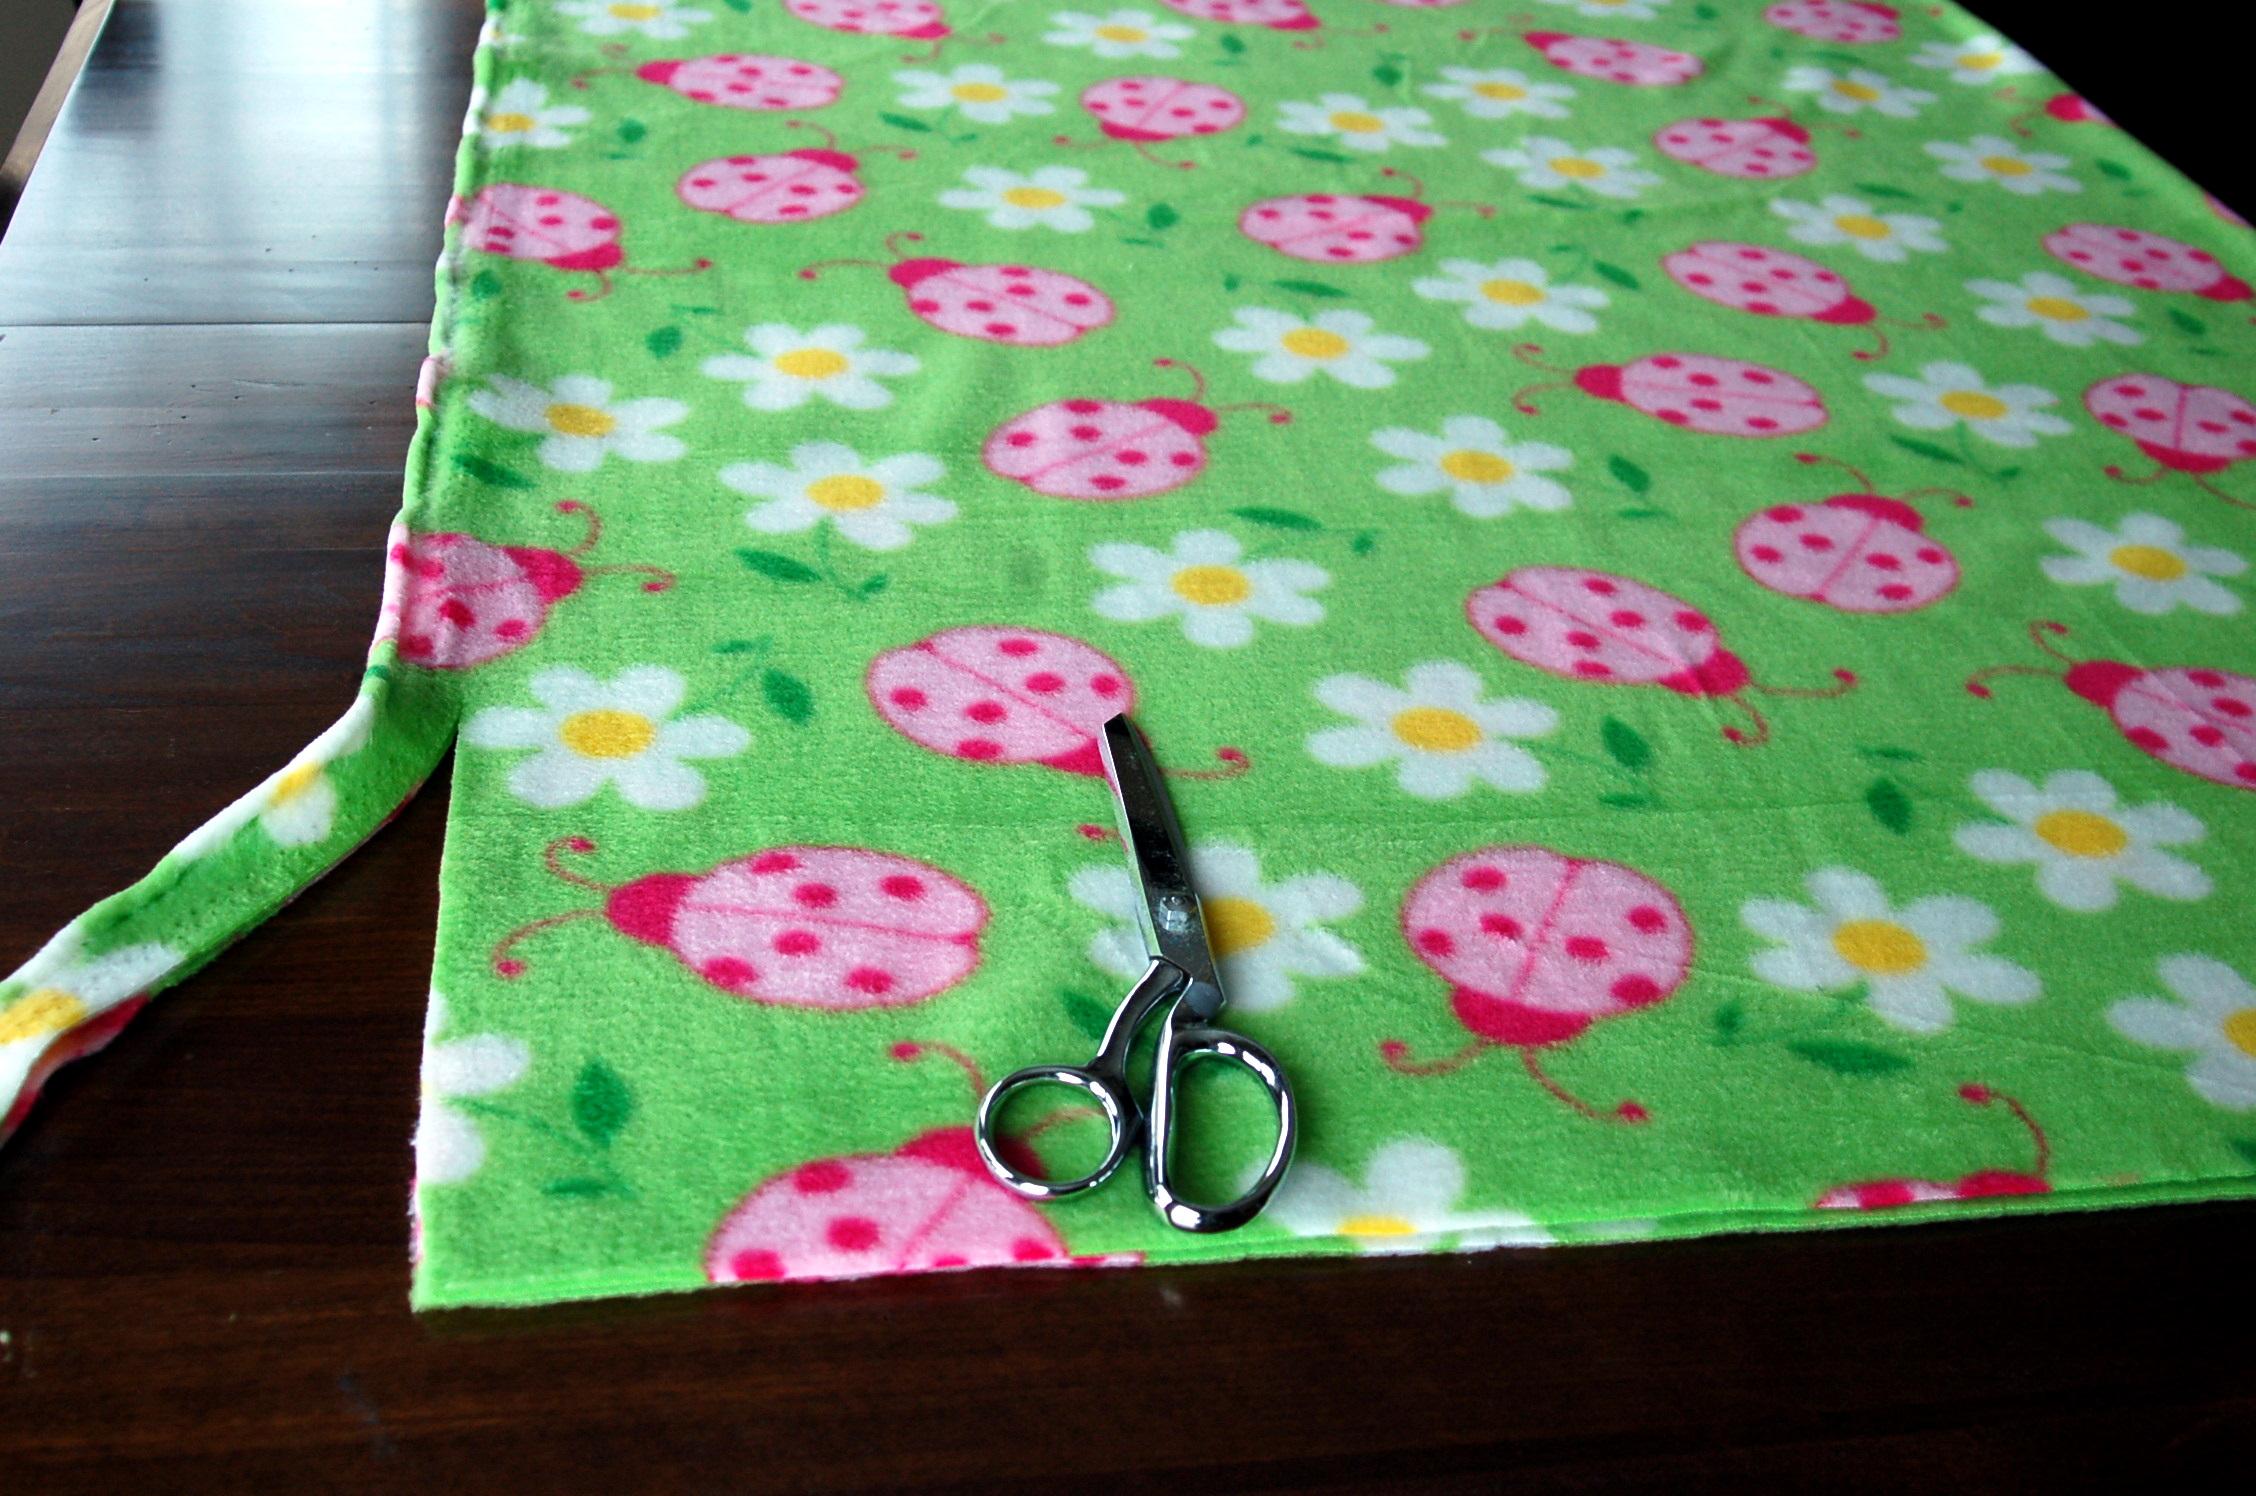 Tie blanket clipart jpg freeuse stock Fringed Fleece Blankets - Pink Polka Dot Creations jpg freeuse stock